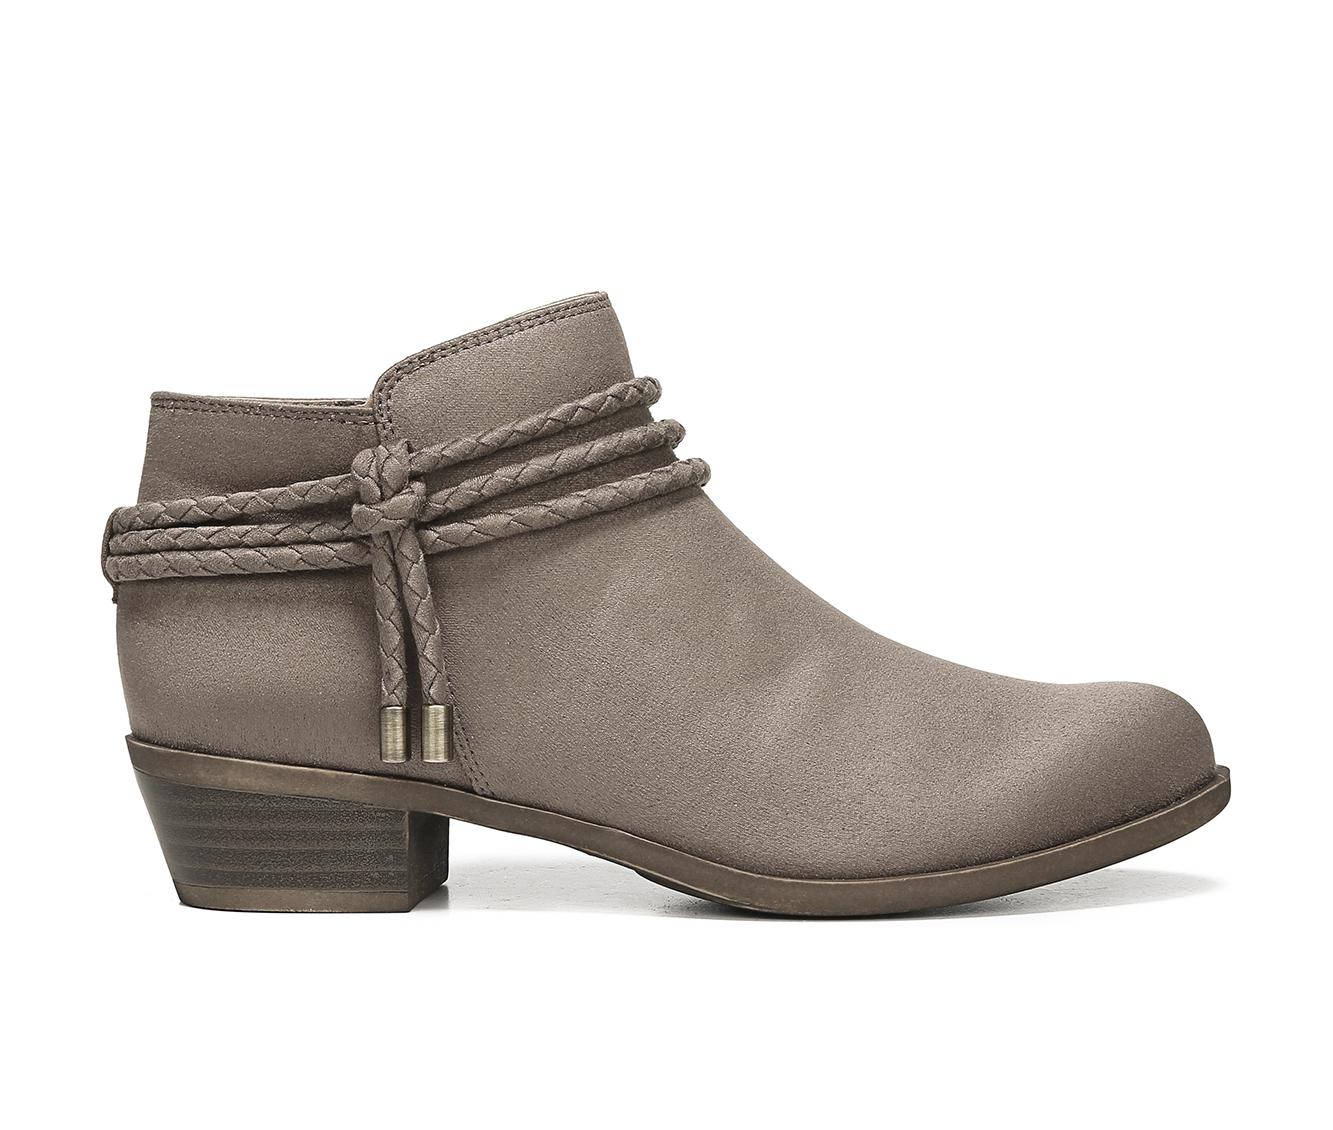 LifeStride Andrea Women's Boots (Brown - Canvas)